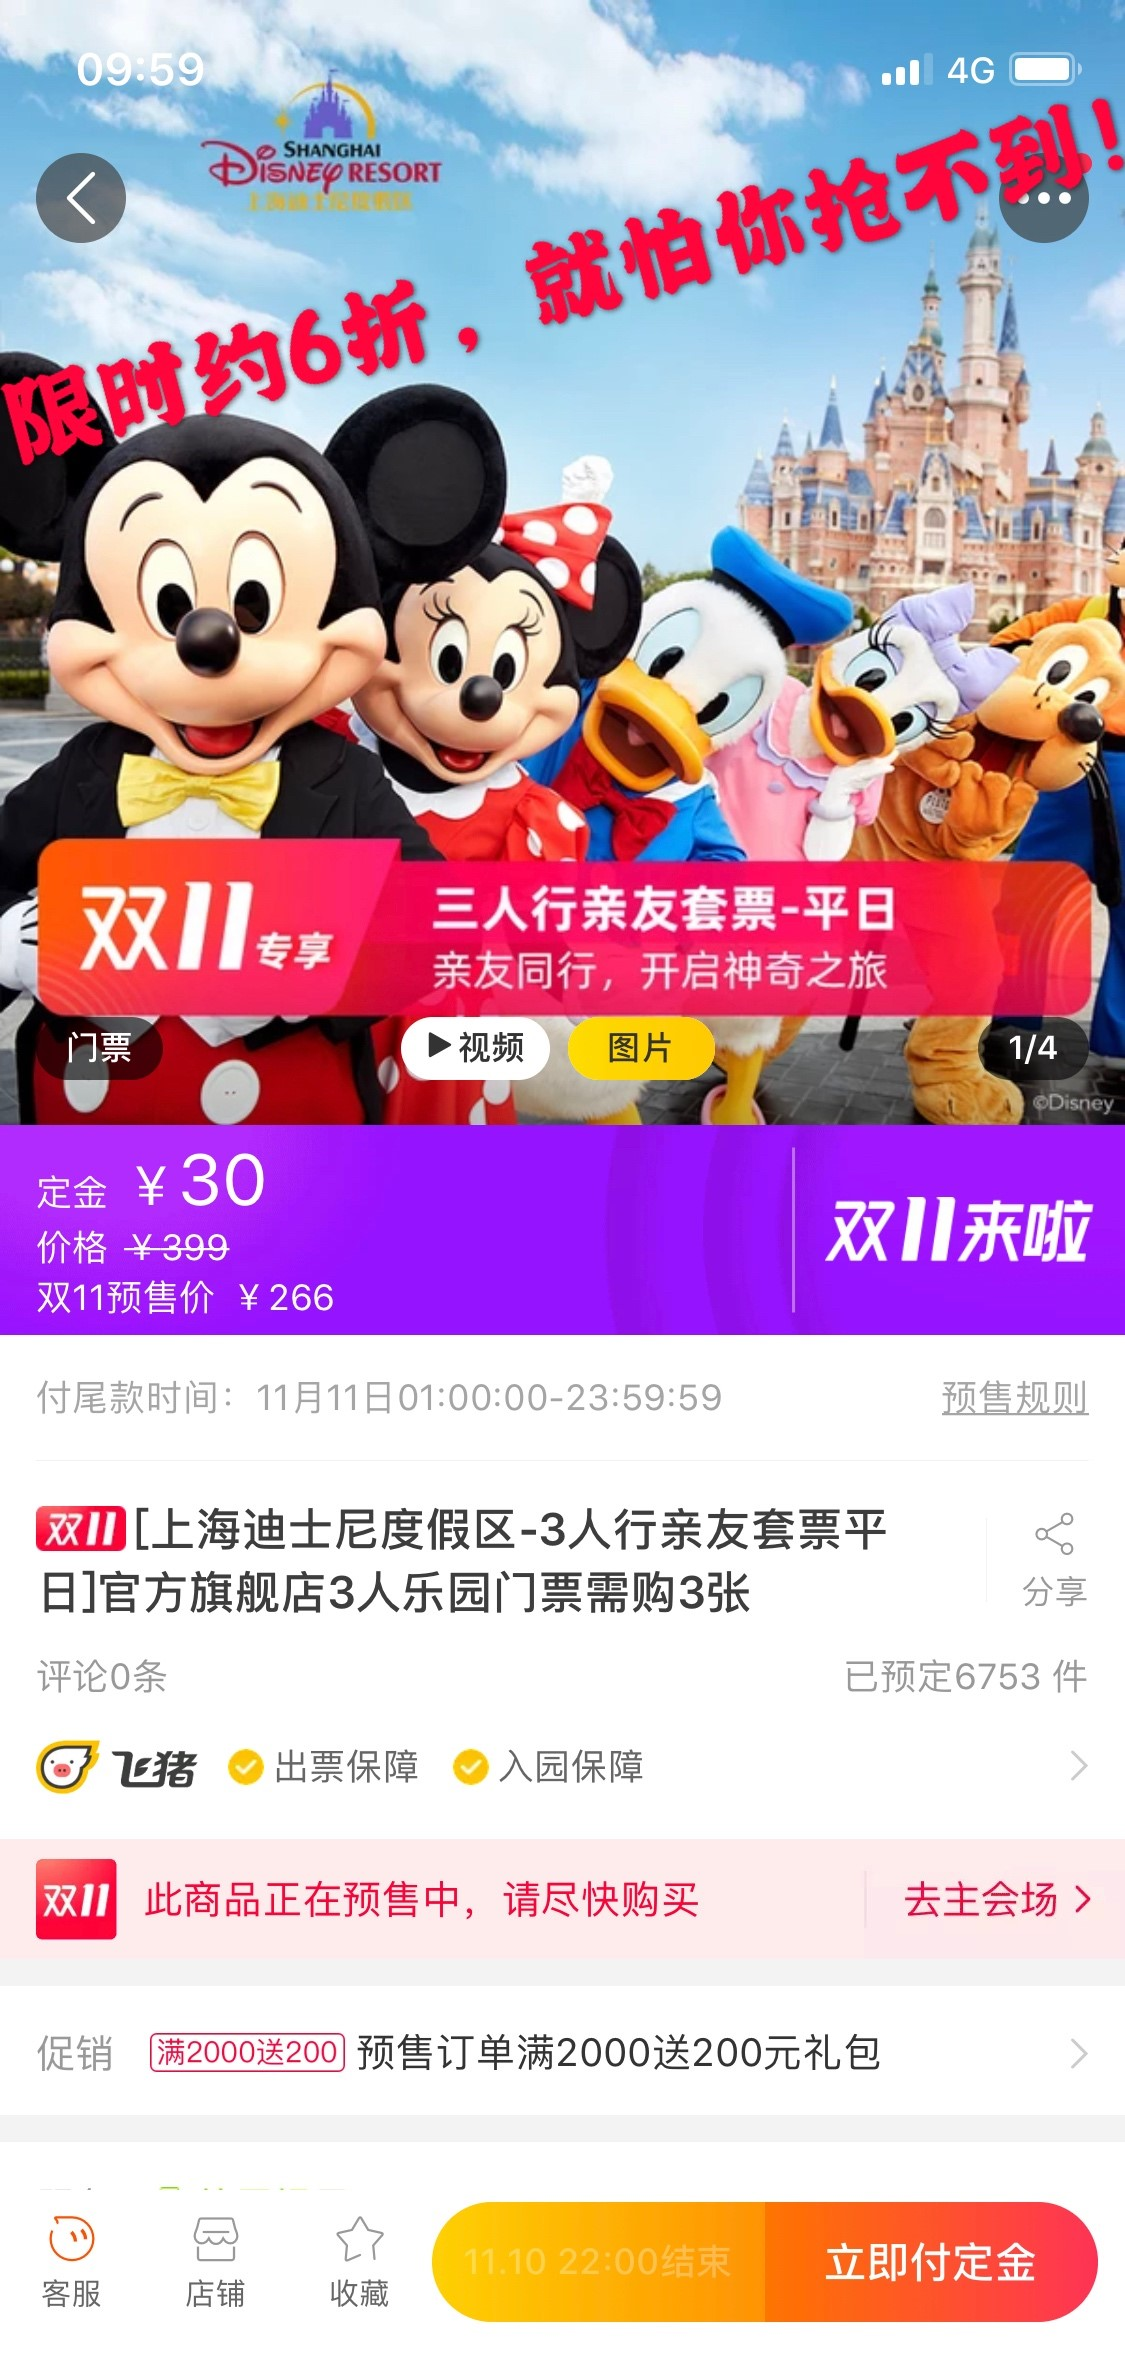 http://www.shangoudaohang.com/nongcun/228367.html